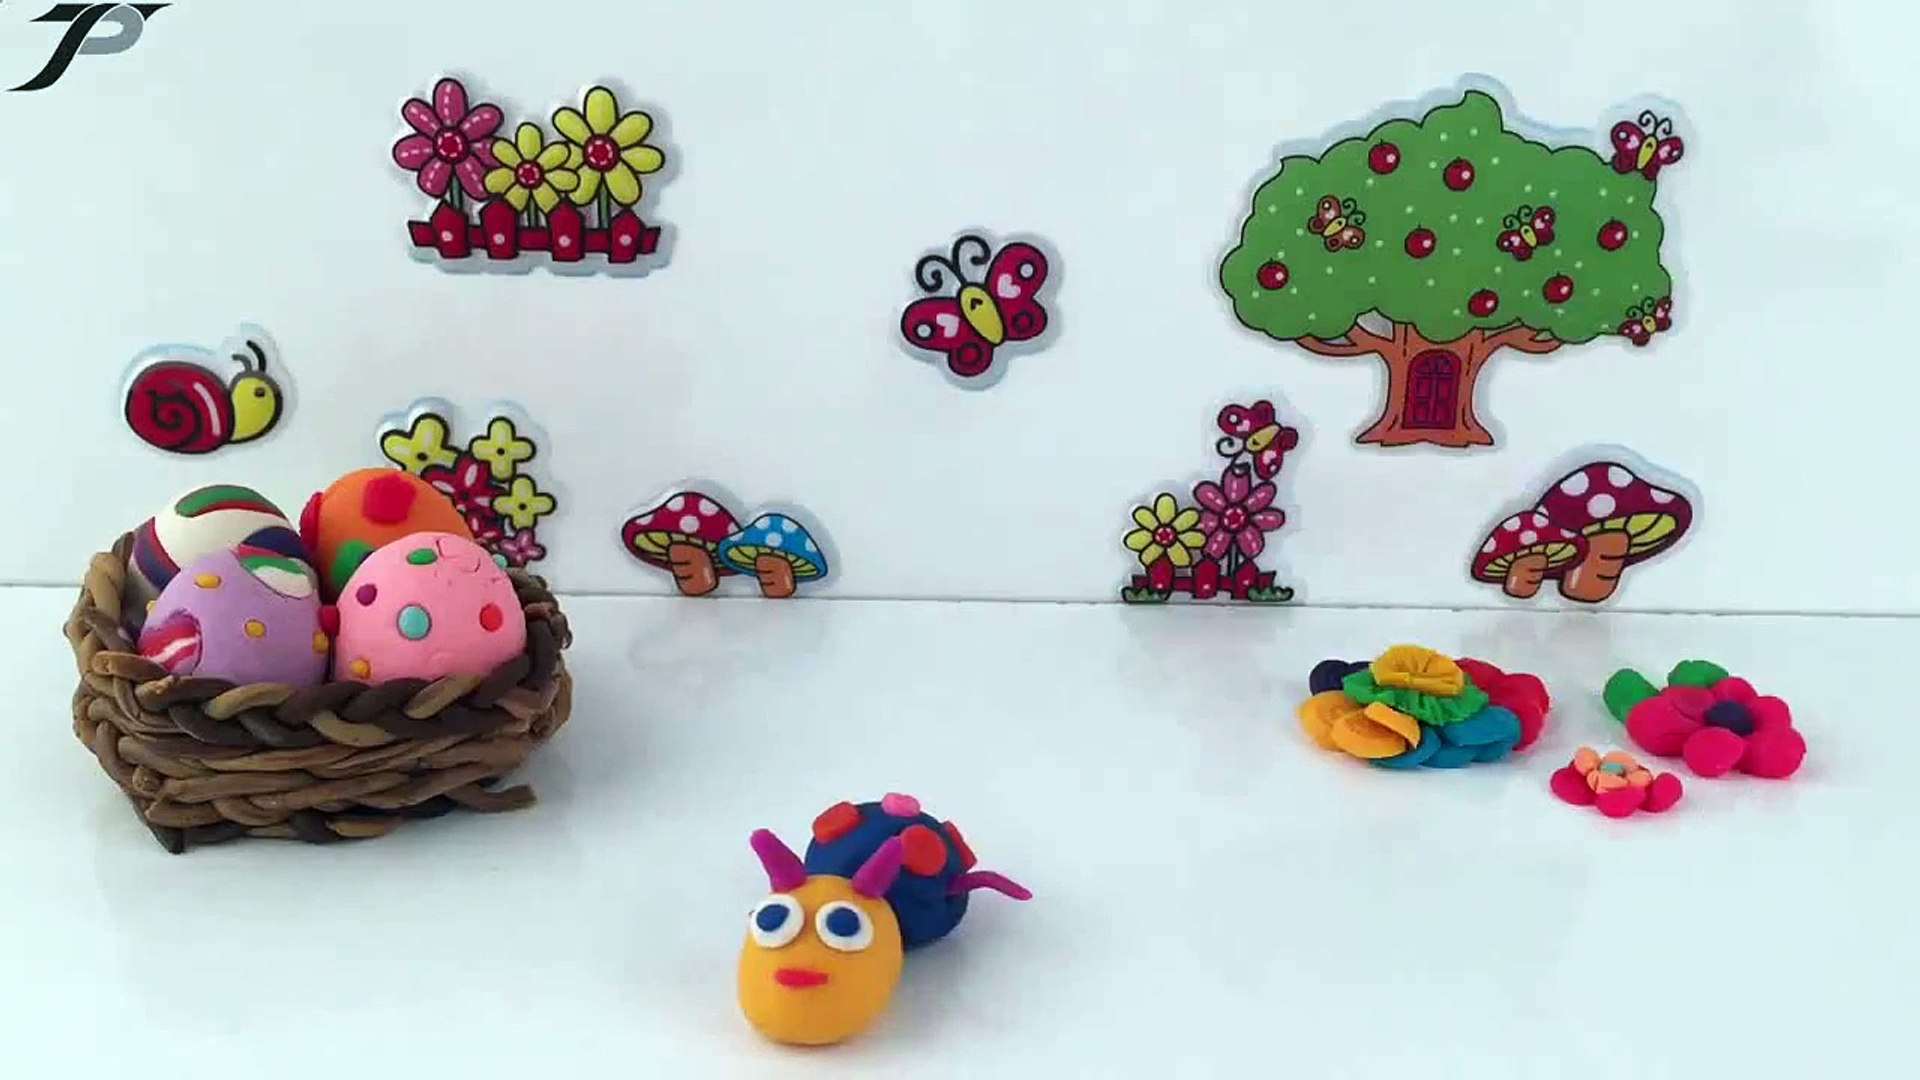 TRIEUPHAM KIDS - Play Doh Kids Fun Crafts, Animals Playdough Learning Activities CATERPILLAR